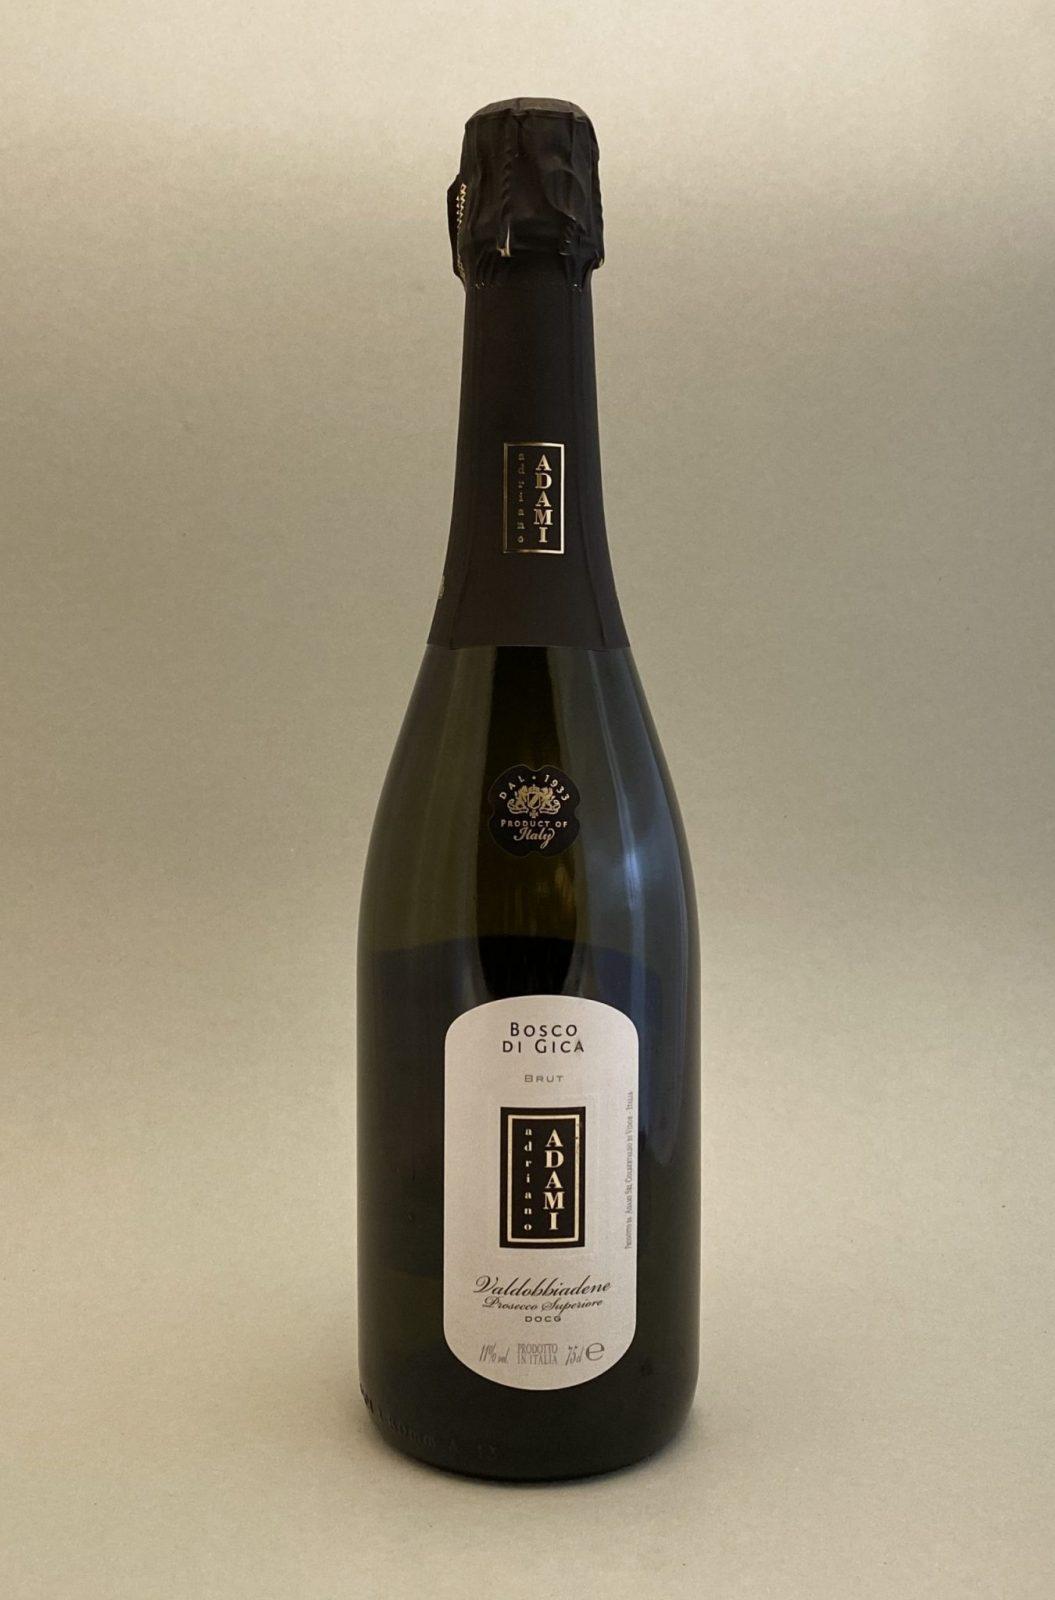 ADRIANO ADAMI Bosco Di Gica Prosecco Brut, Bulbinkove vino, vinotéka Bratislava Slnecnice, Sunnywines, rozvoz vina, winebar